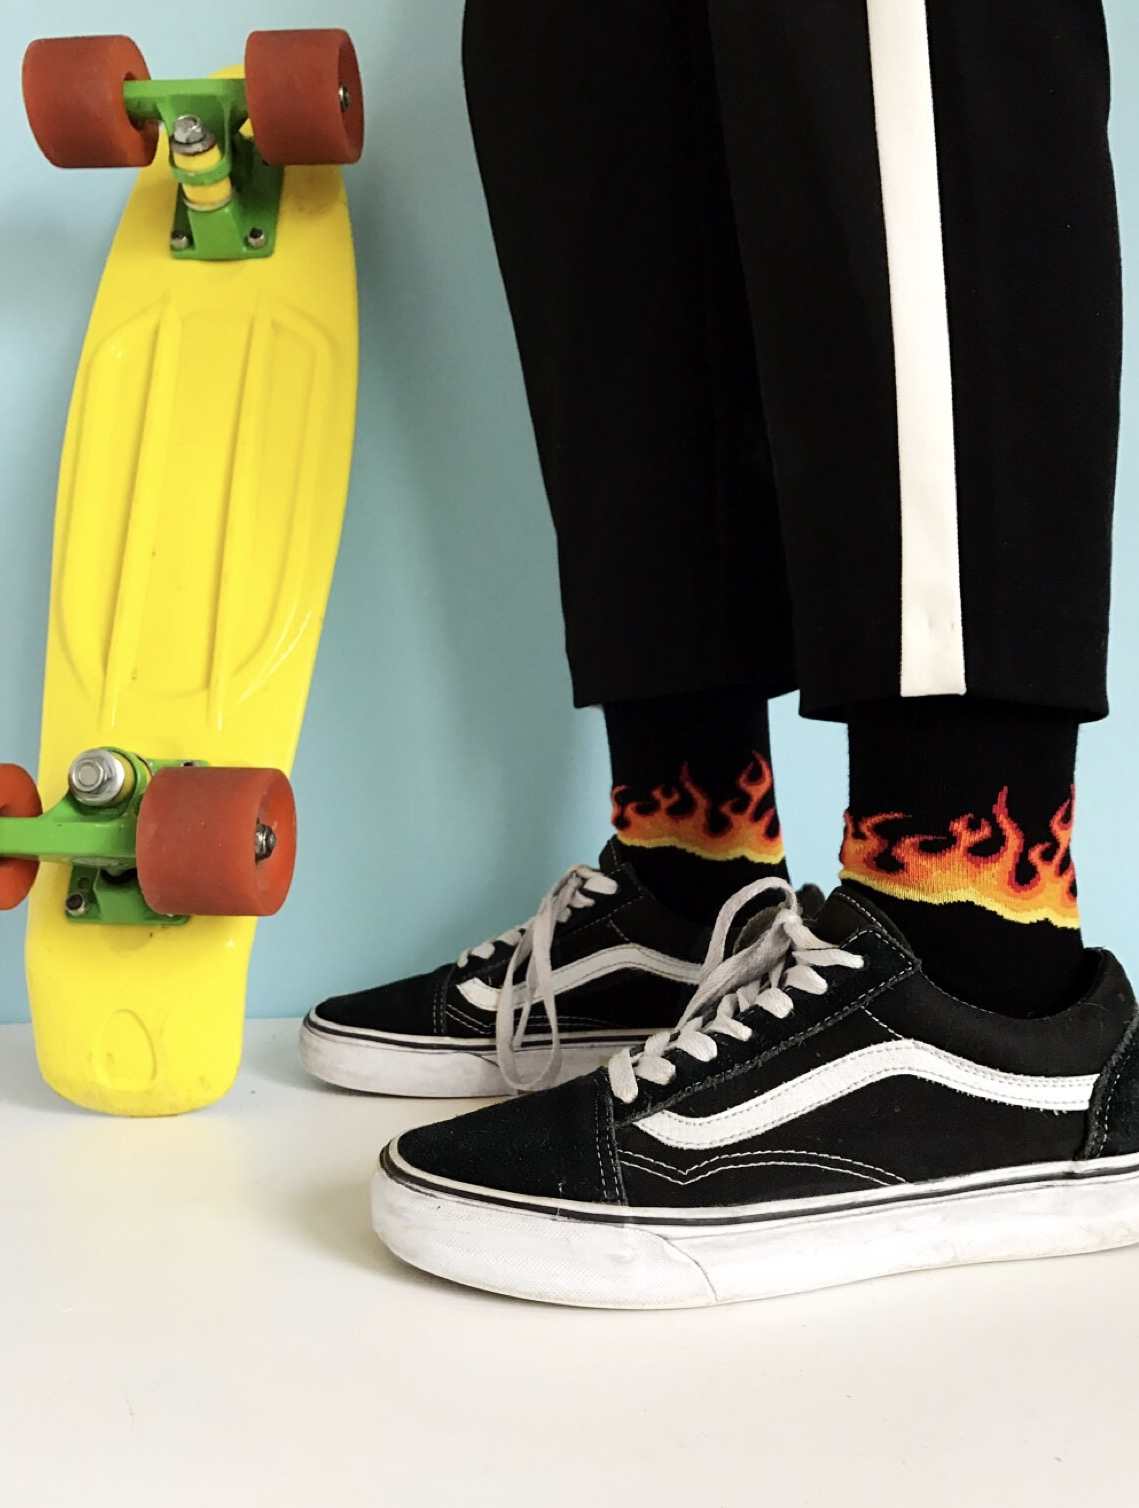 rebelsmarket_black_socks_with_hot_fire_flames_socks_4.jpg